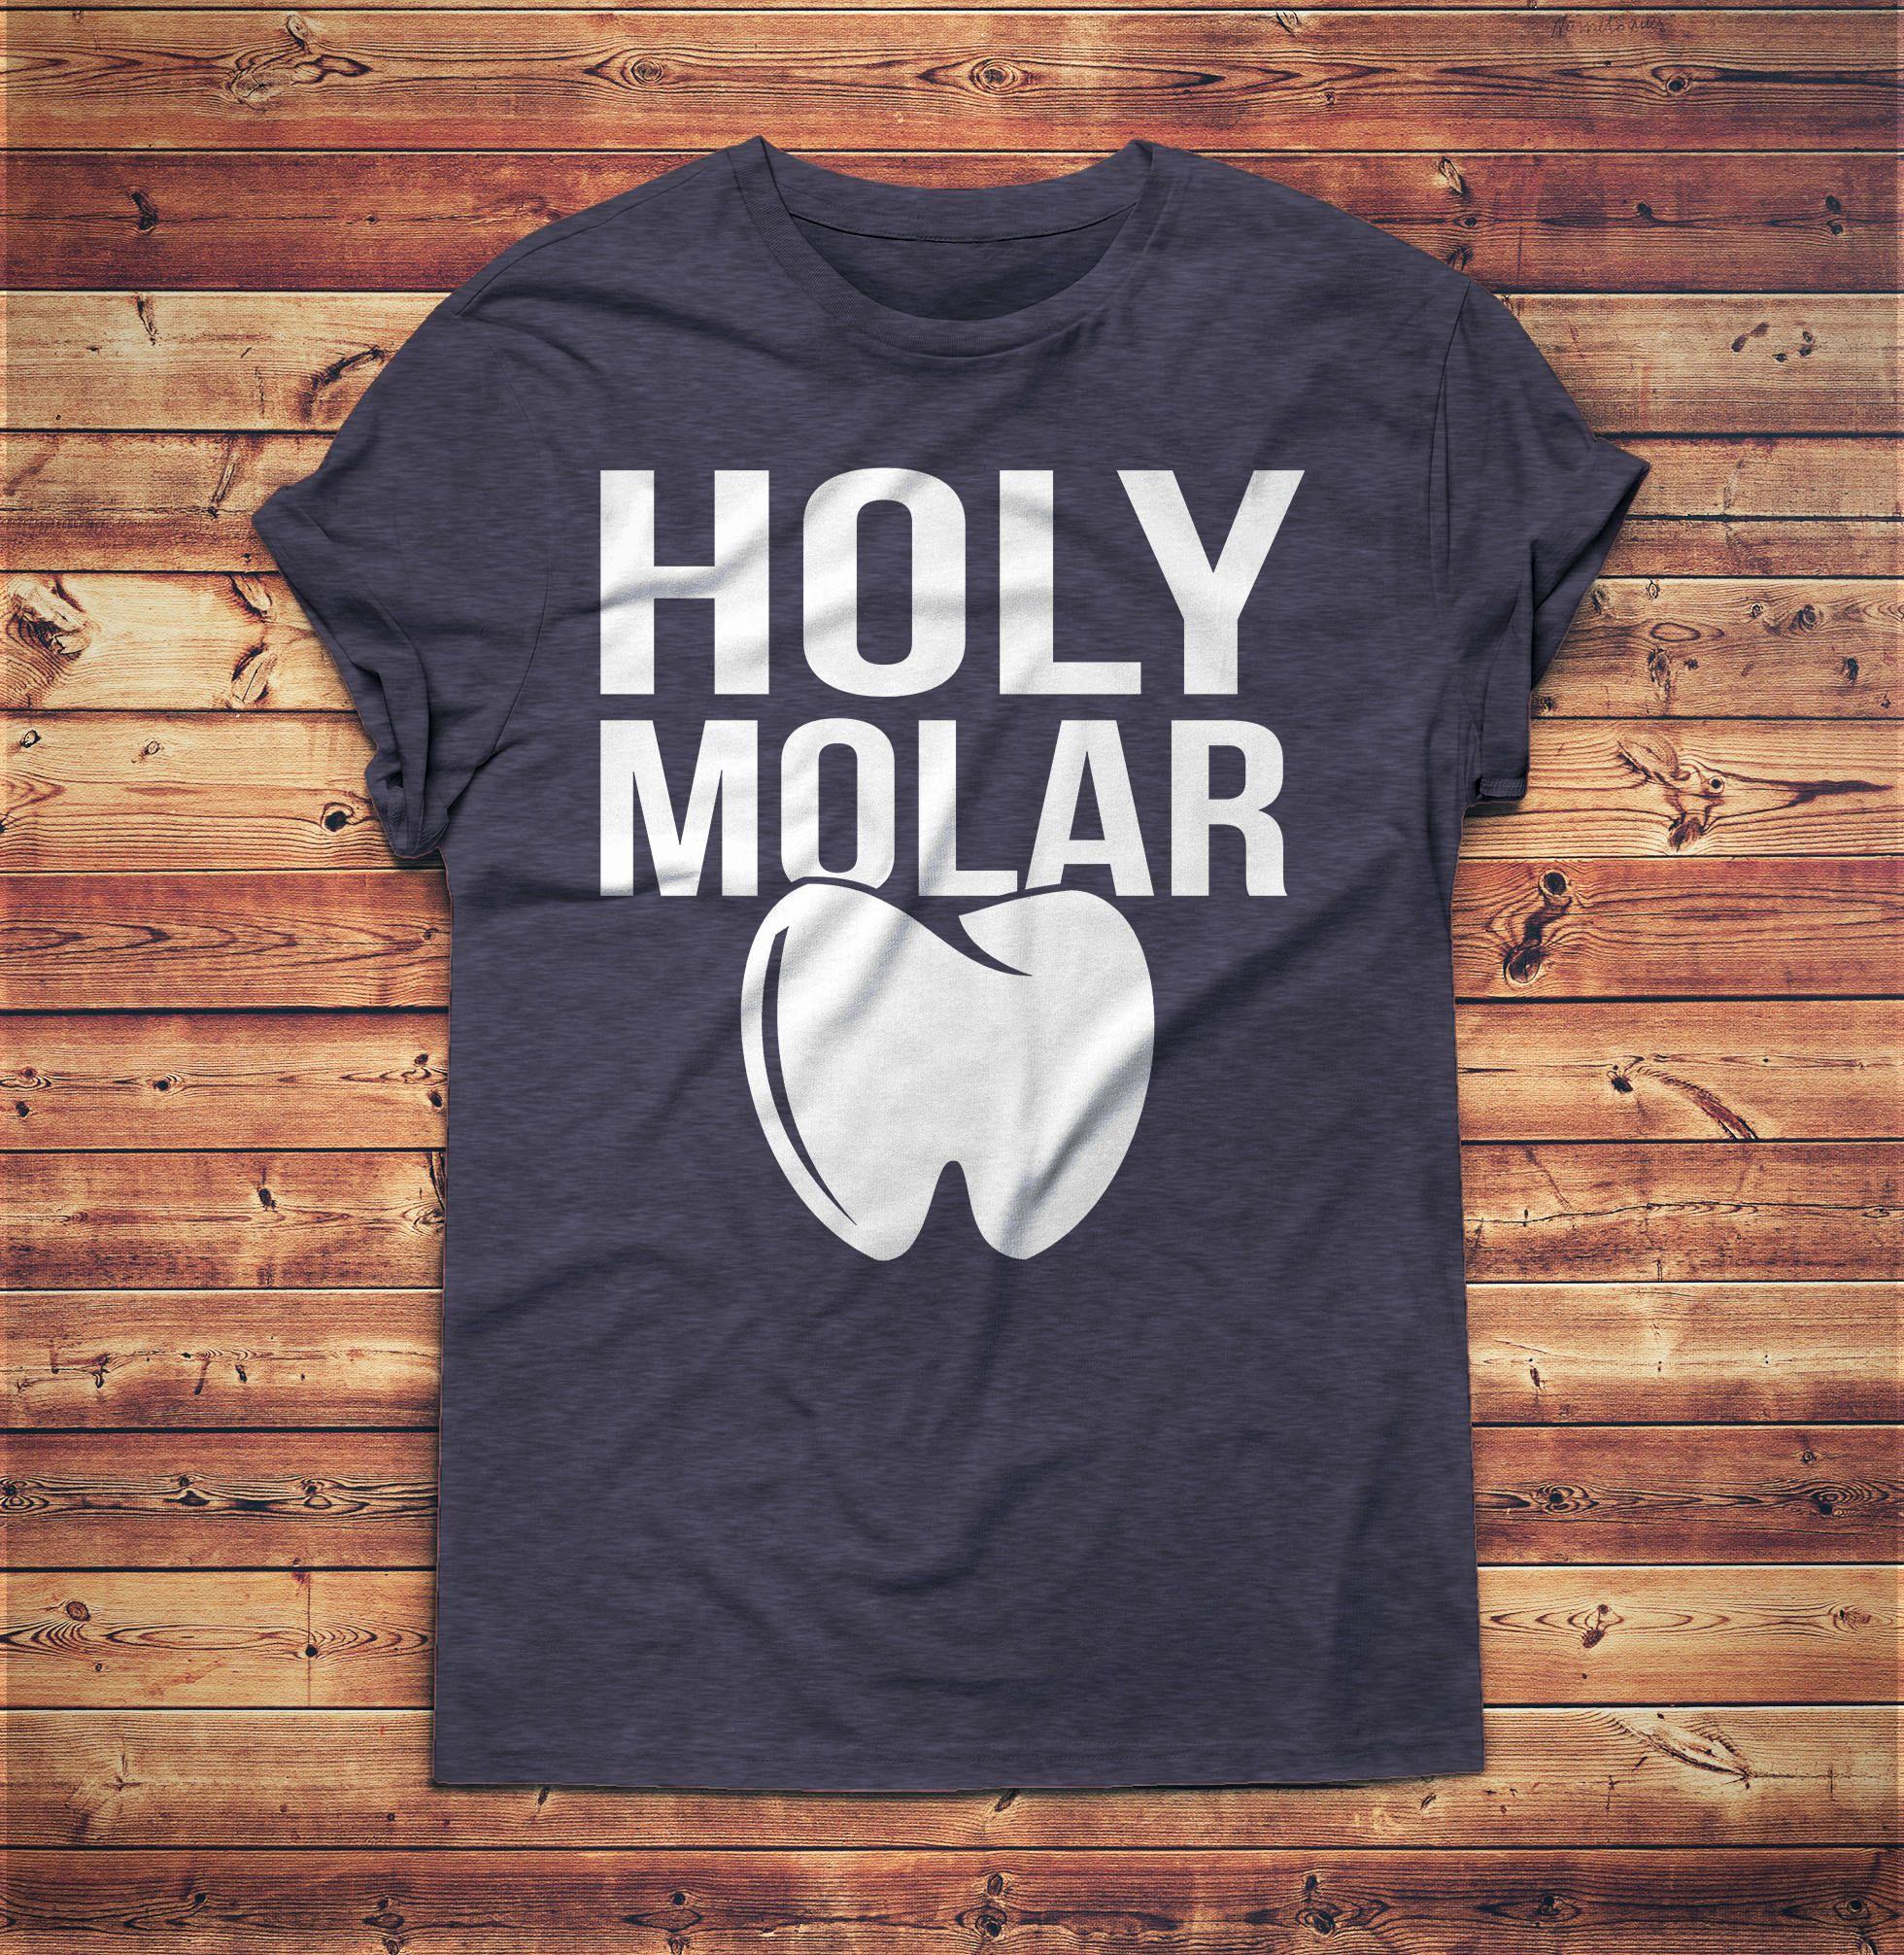 aafd5b84 Holy Molar Shirt - Dental Student Shirt - Funny Dentist Gifts - Dentist  Gift, Dental Hygienist, Tooth Fairy, Dentist Gifts, Dentist Graduation, ...